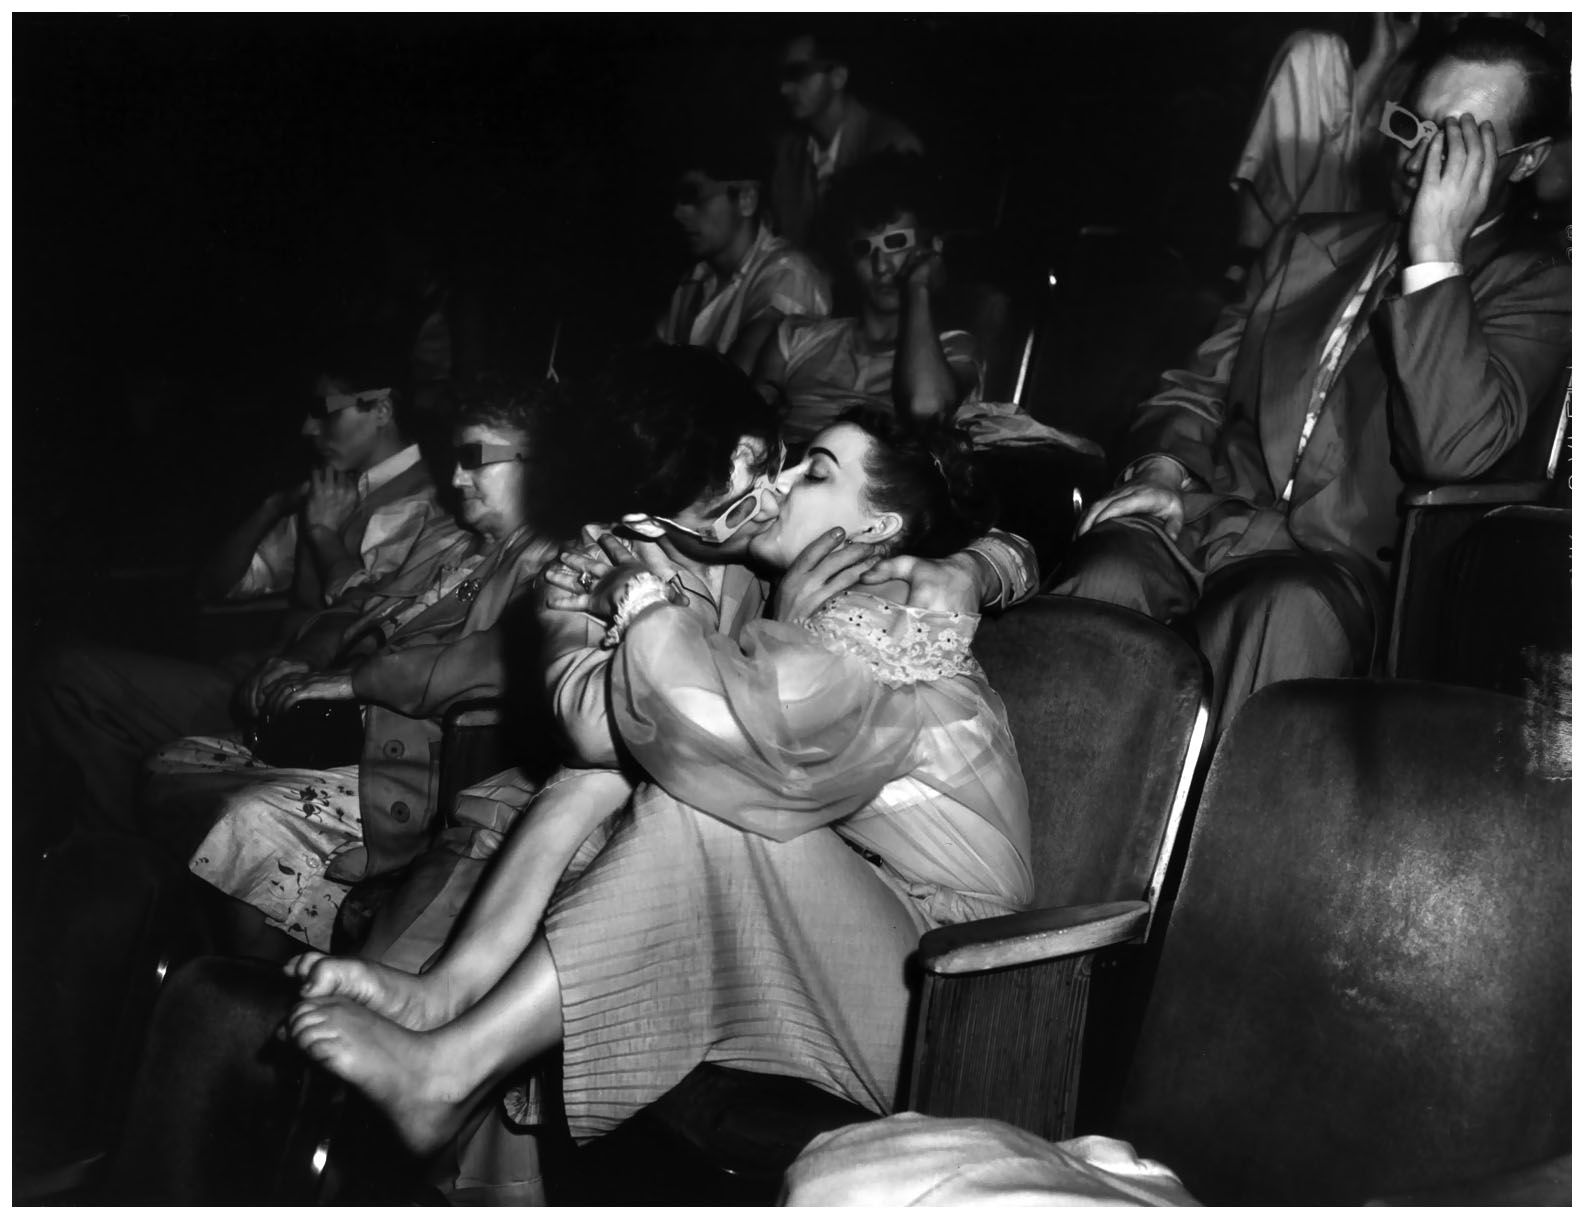 arthur-felling-aka-weegeec2a022at-the-palace-theater22-ca-1945.jpeg (1585×1220)